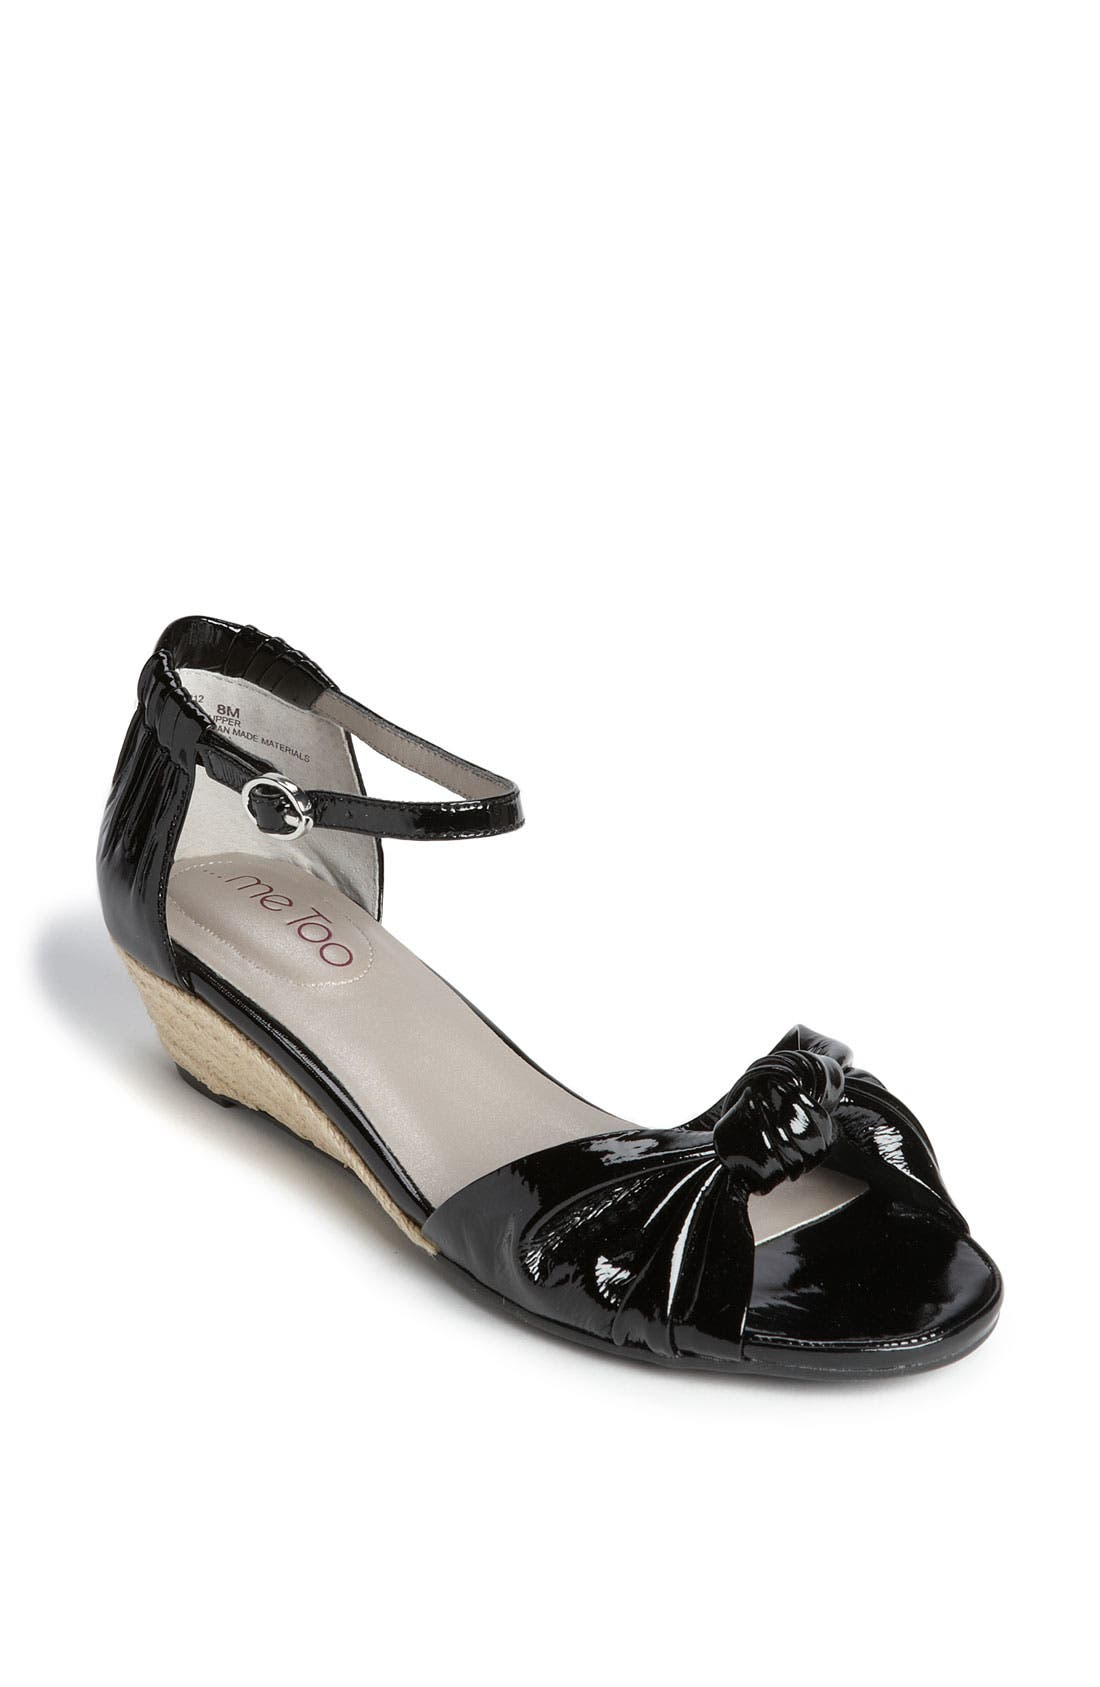 Main Image - Me Too 'Sadie' Wedge Sandal